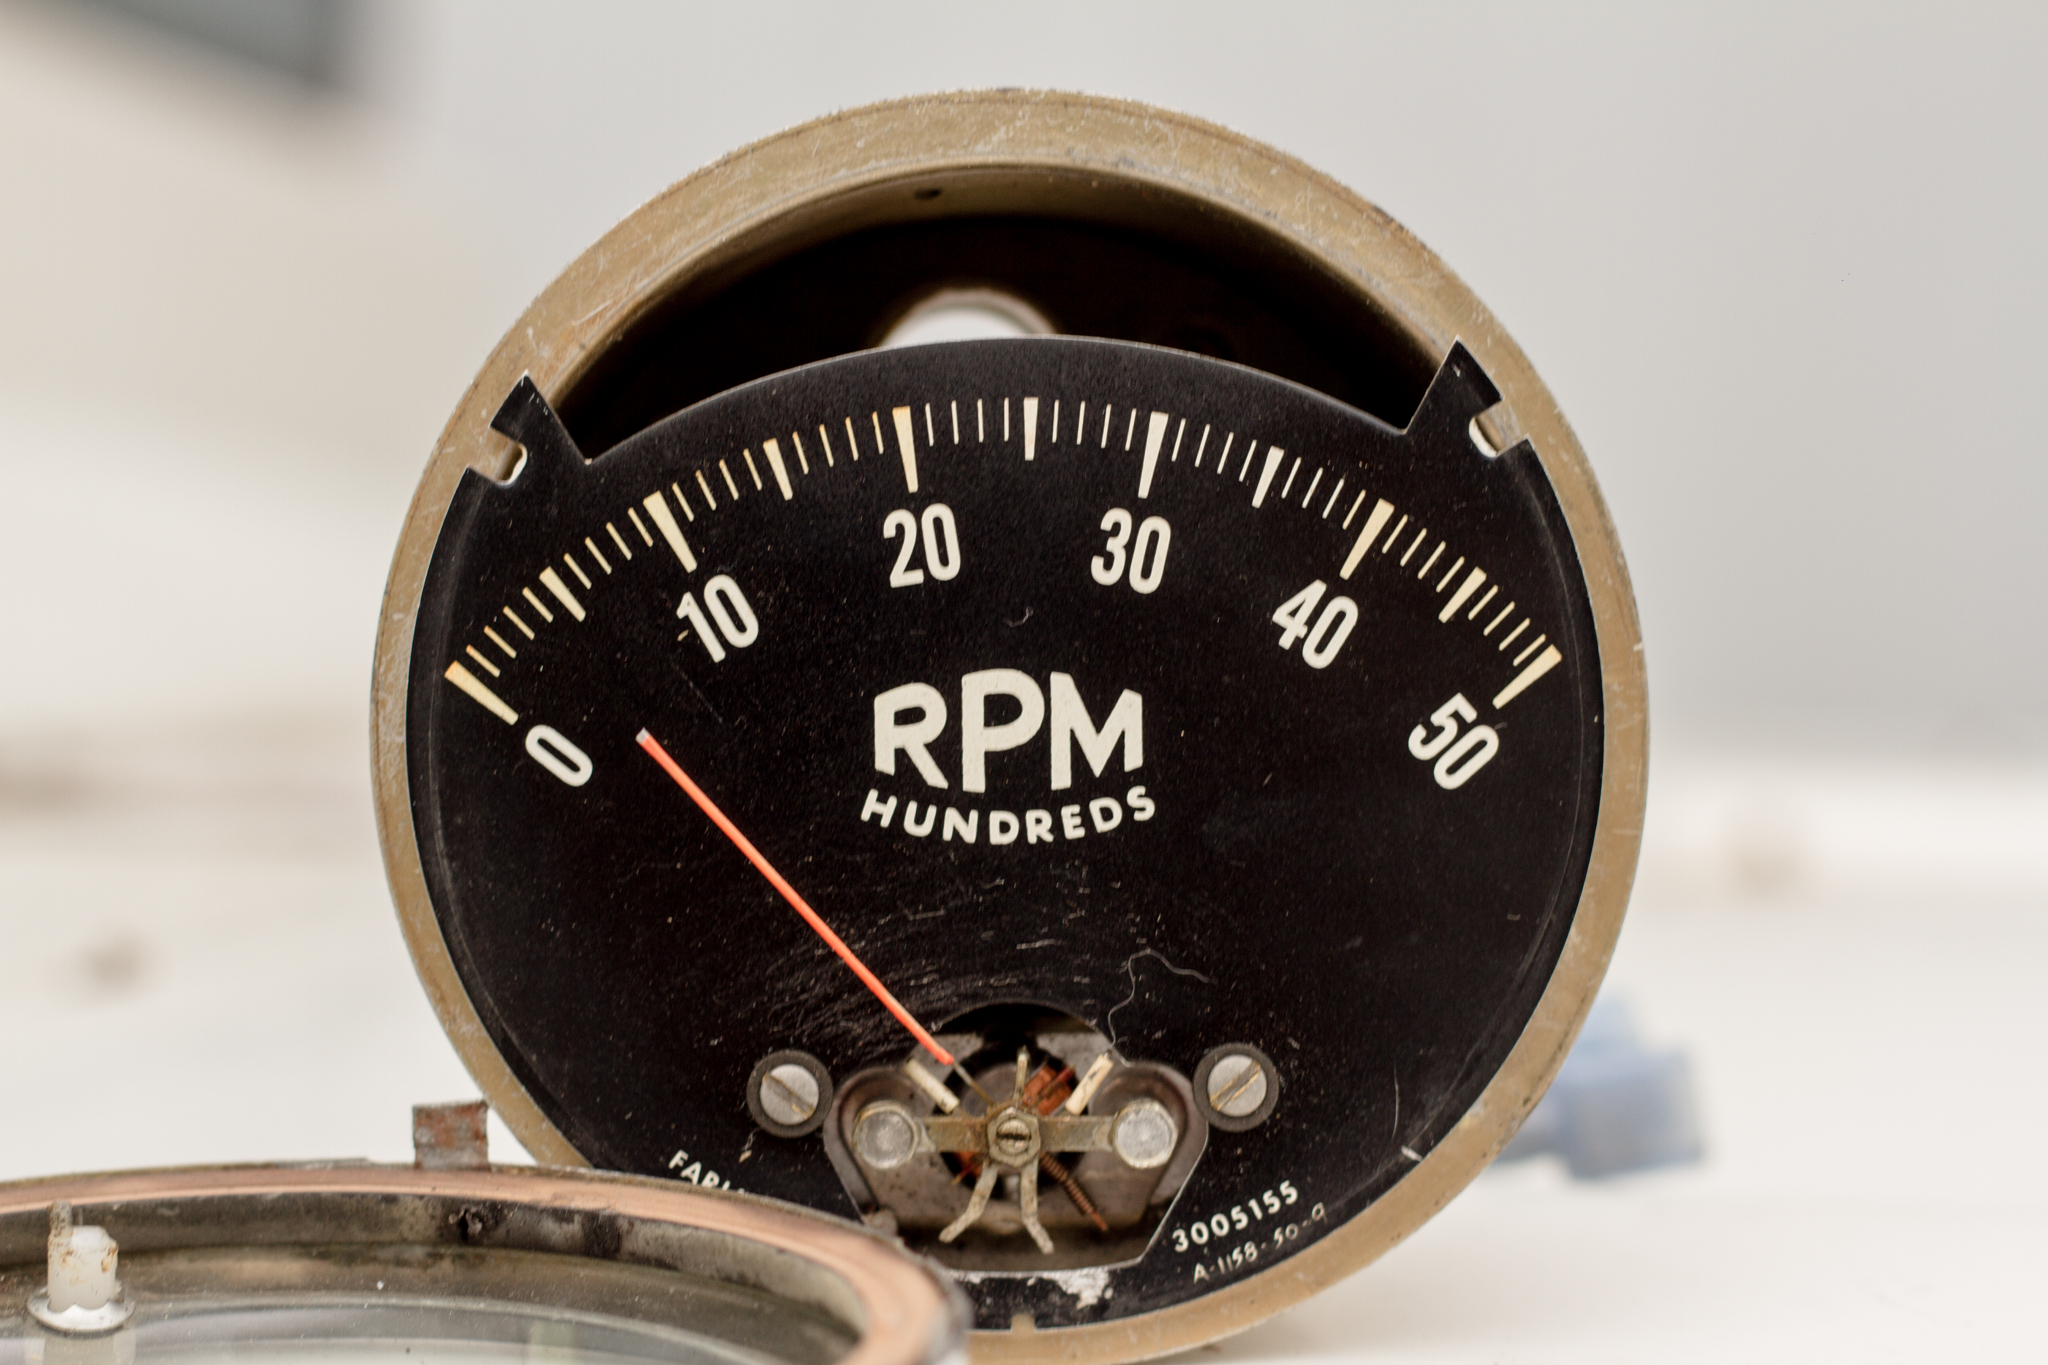 mg_0714?w\=930\&h\=620 vintage stewart warner tachometer wiring diagram stewart warner vintage stewart warner tachometer wiring diagram at edmiracle.co